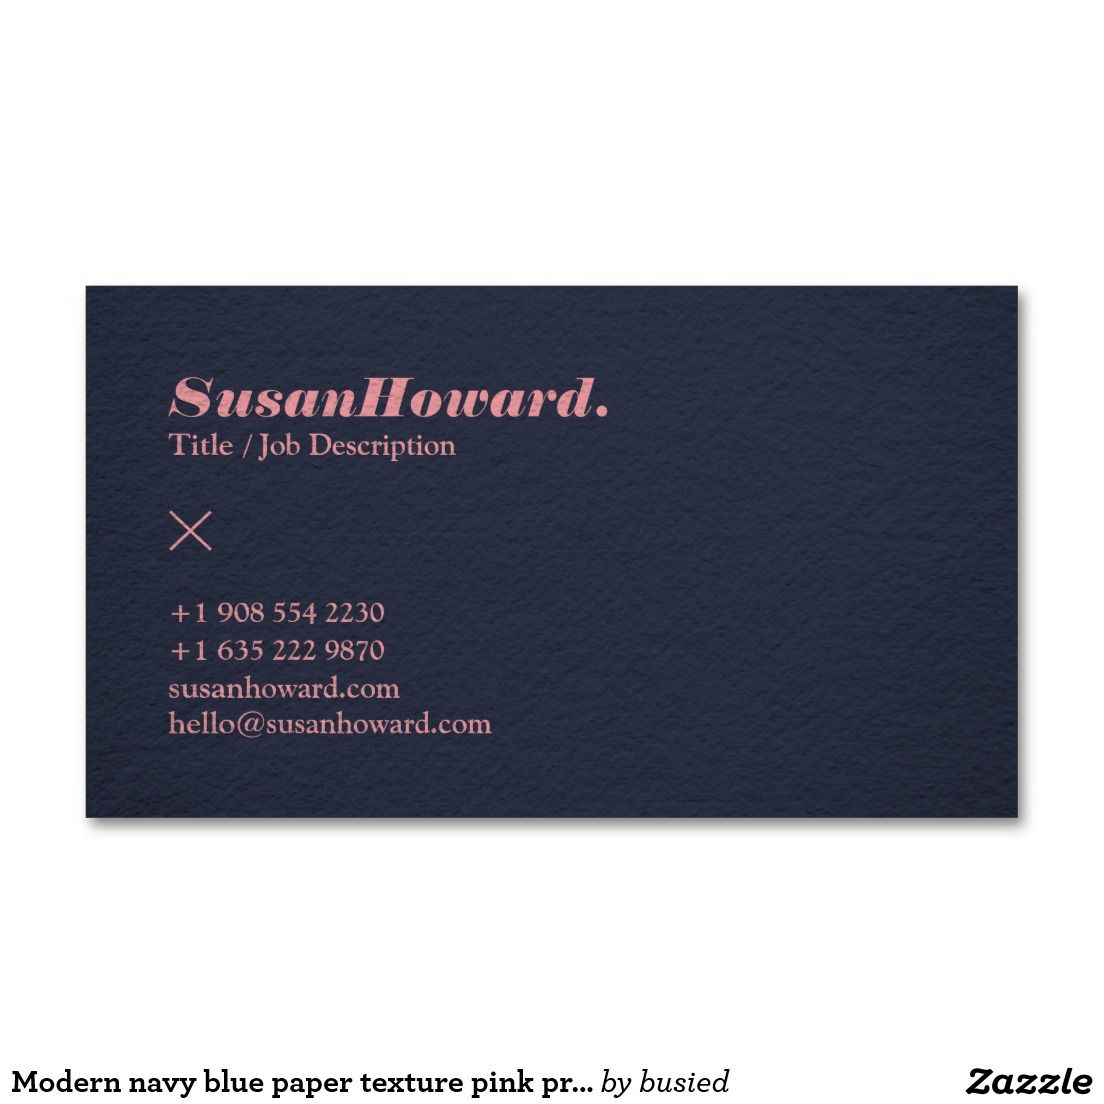 Modern navy blue paper texture pink professional business card ...